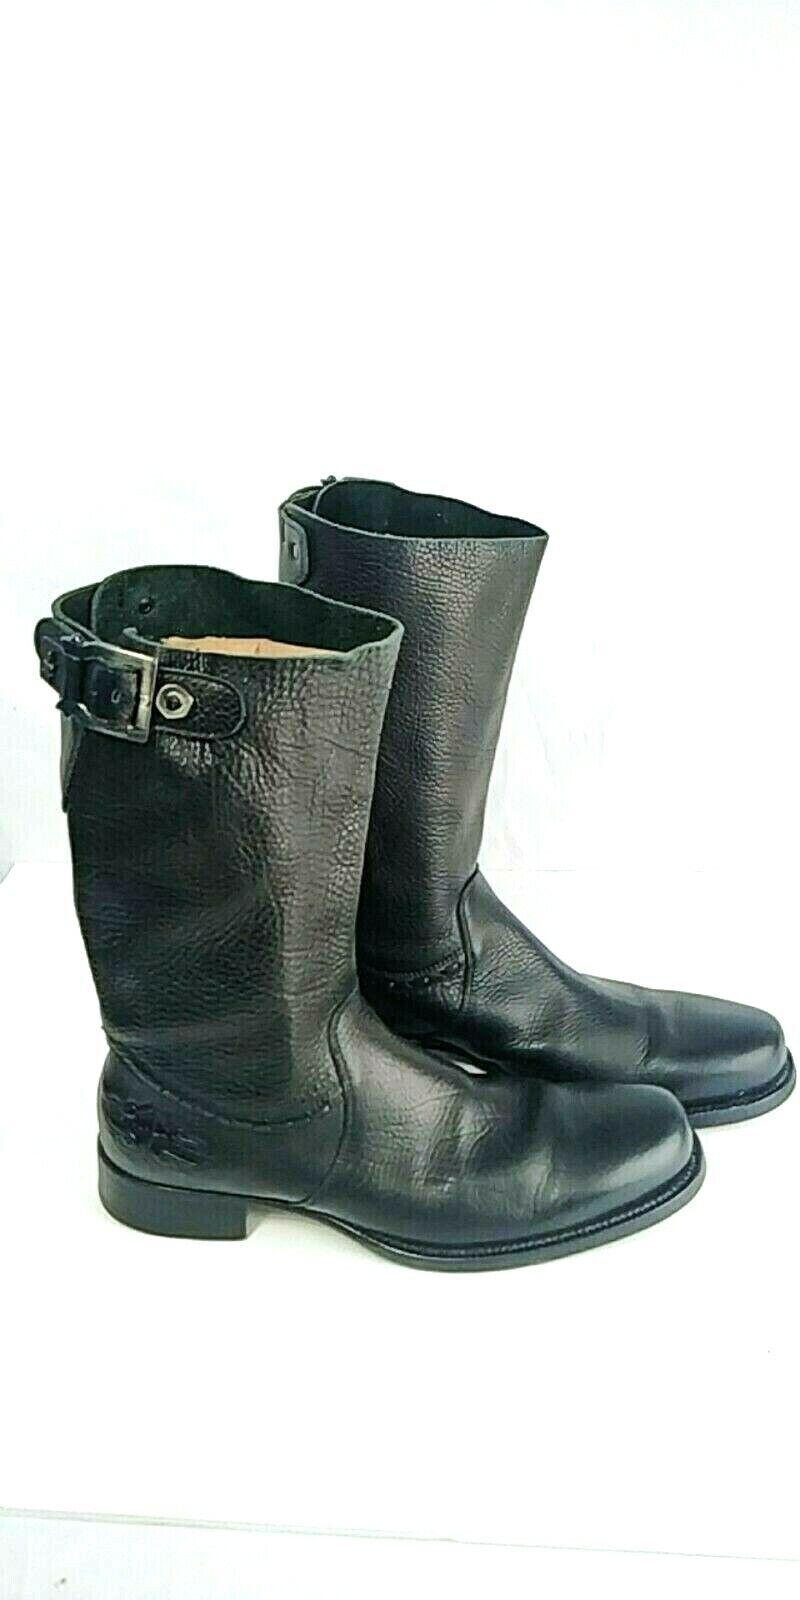 Authentic Cesare Paciotti US 9 Deer Deer Deer Skin Leather Stiefel Italian Designer schuhe 3753f4